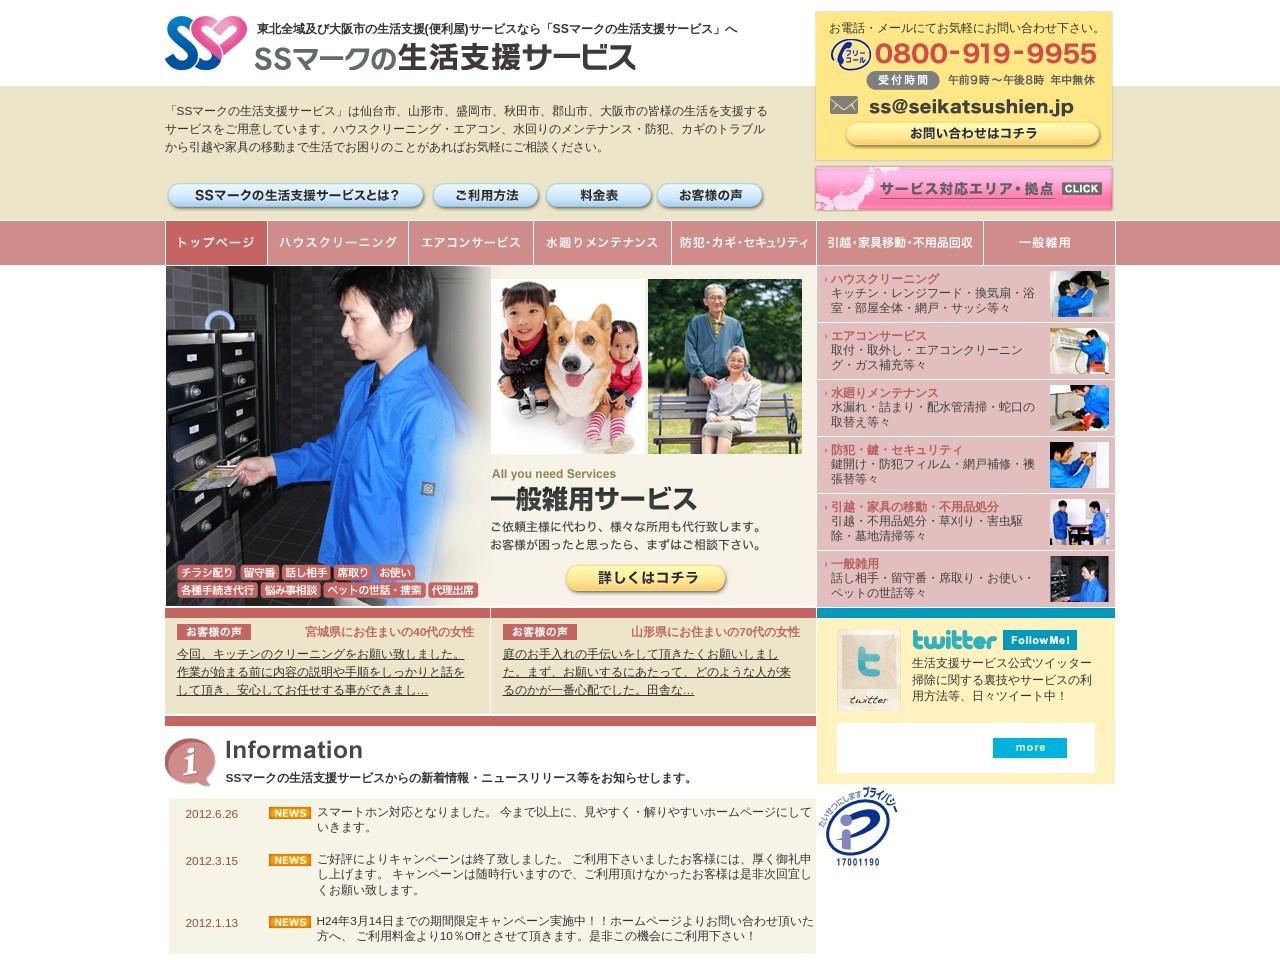 SSマークの生活支援サービス仙台支店